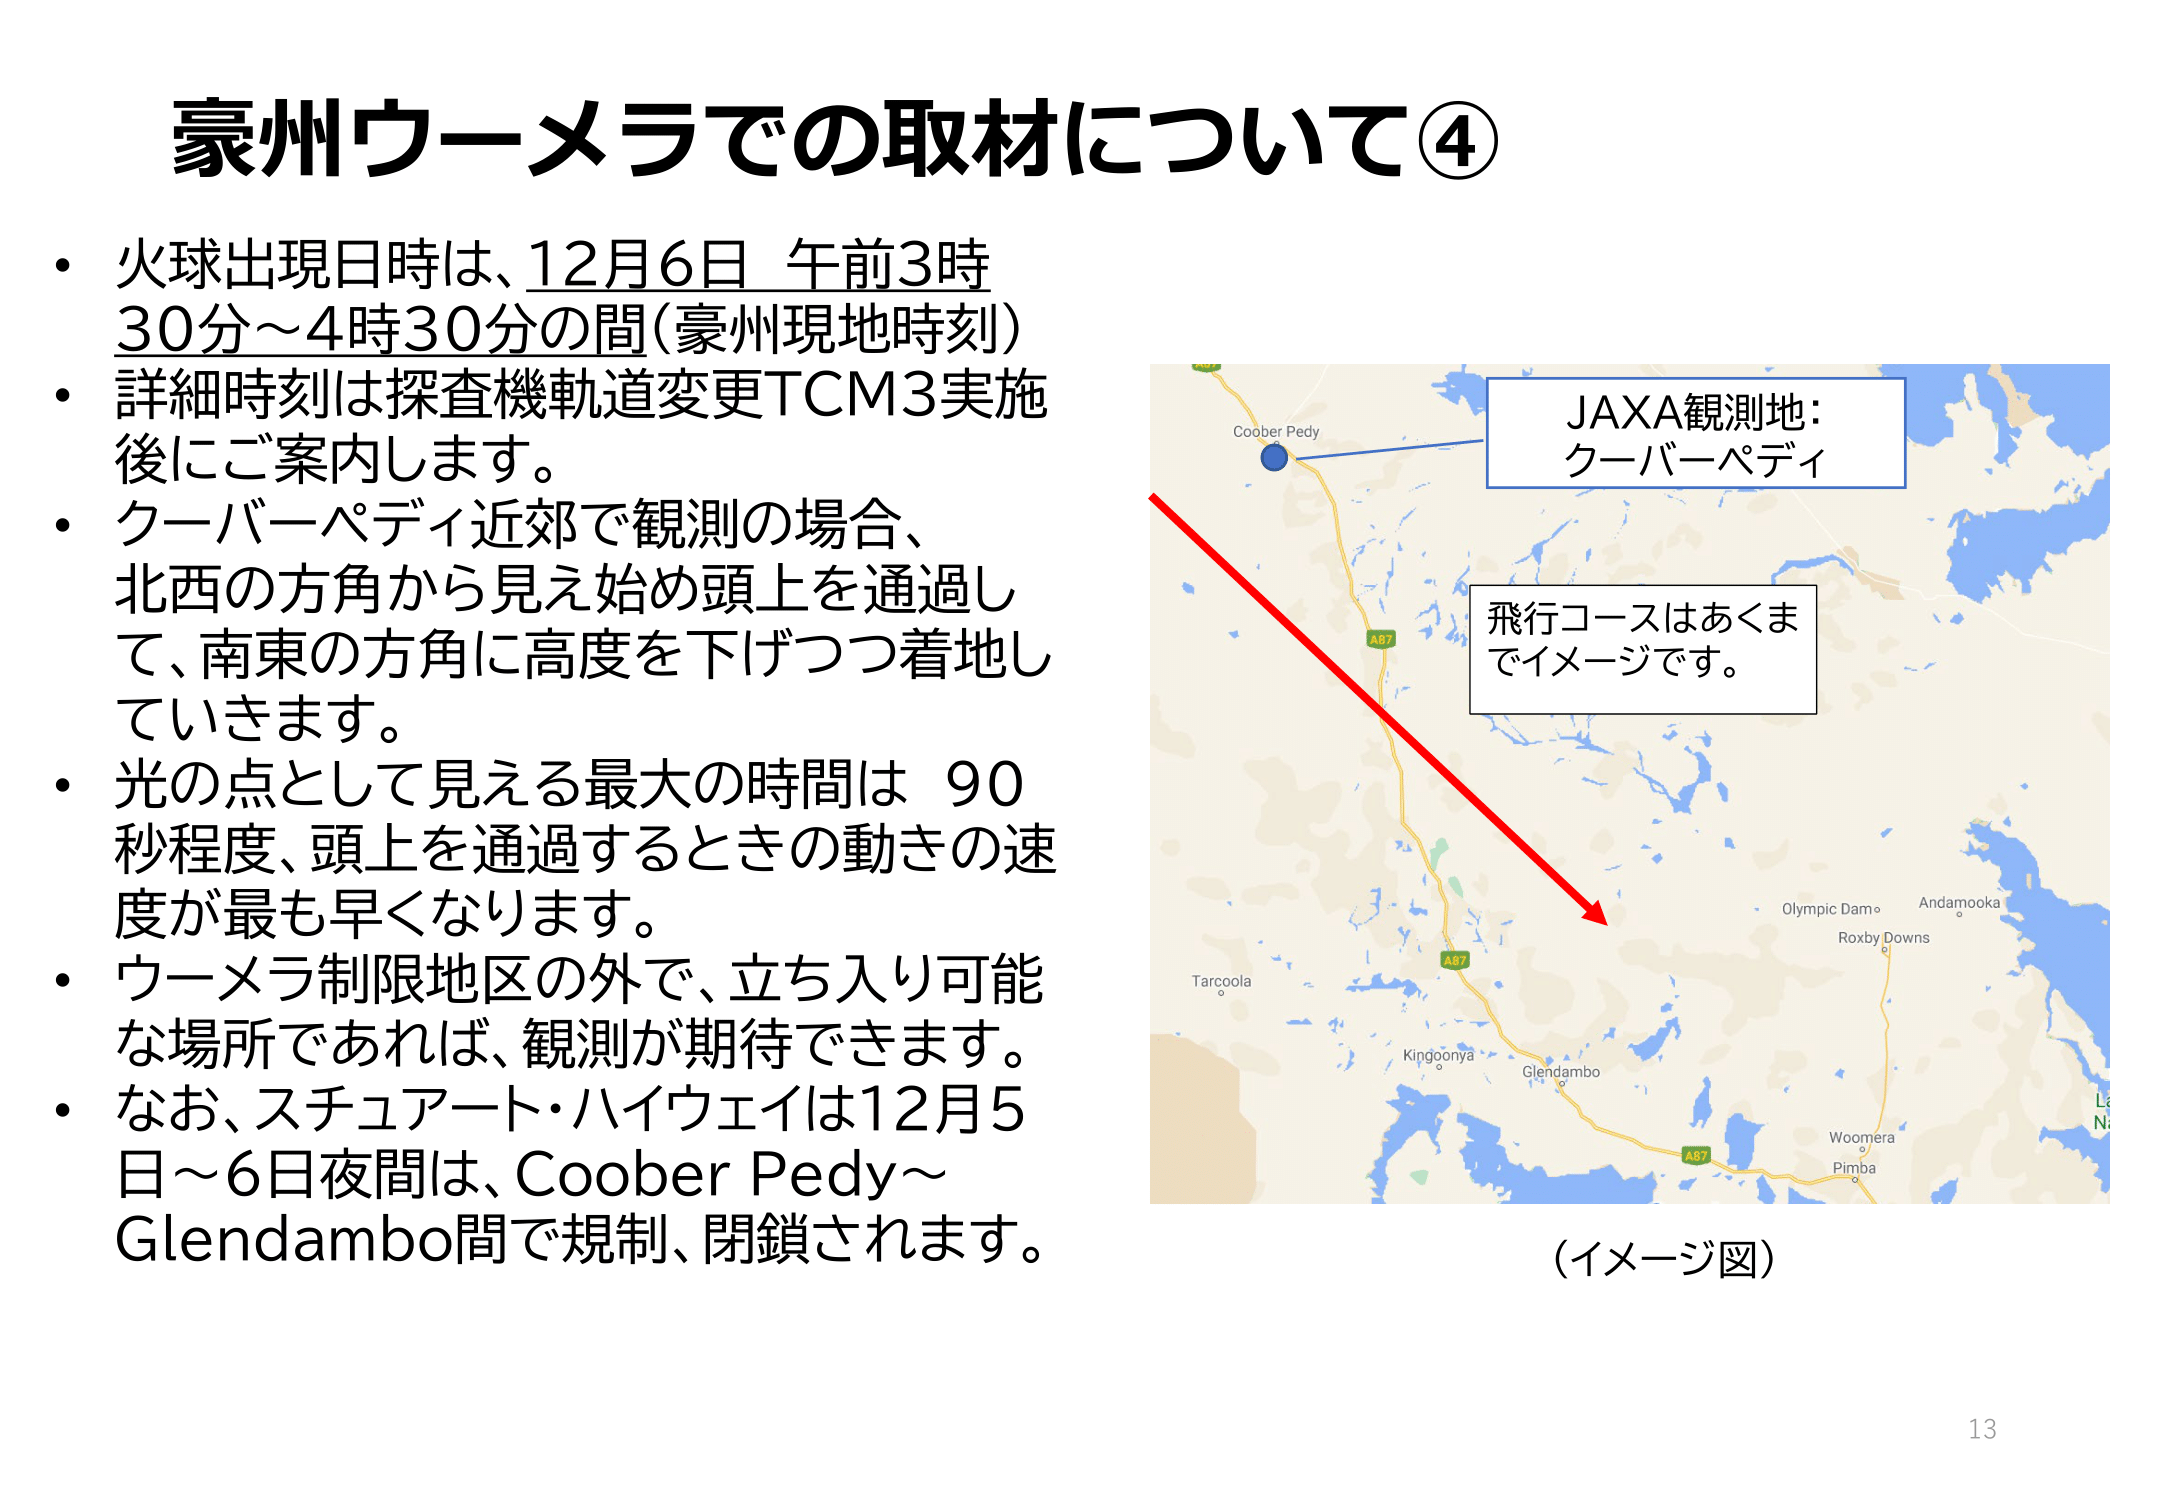 f:id:Imamura:20201117222319p:plain